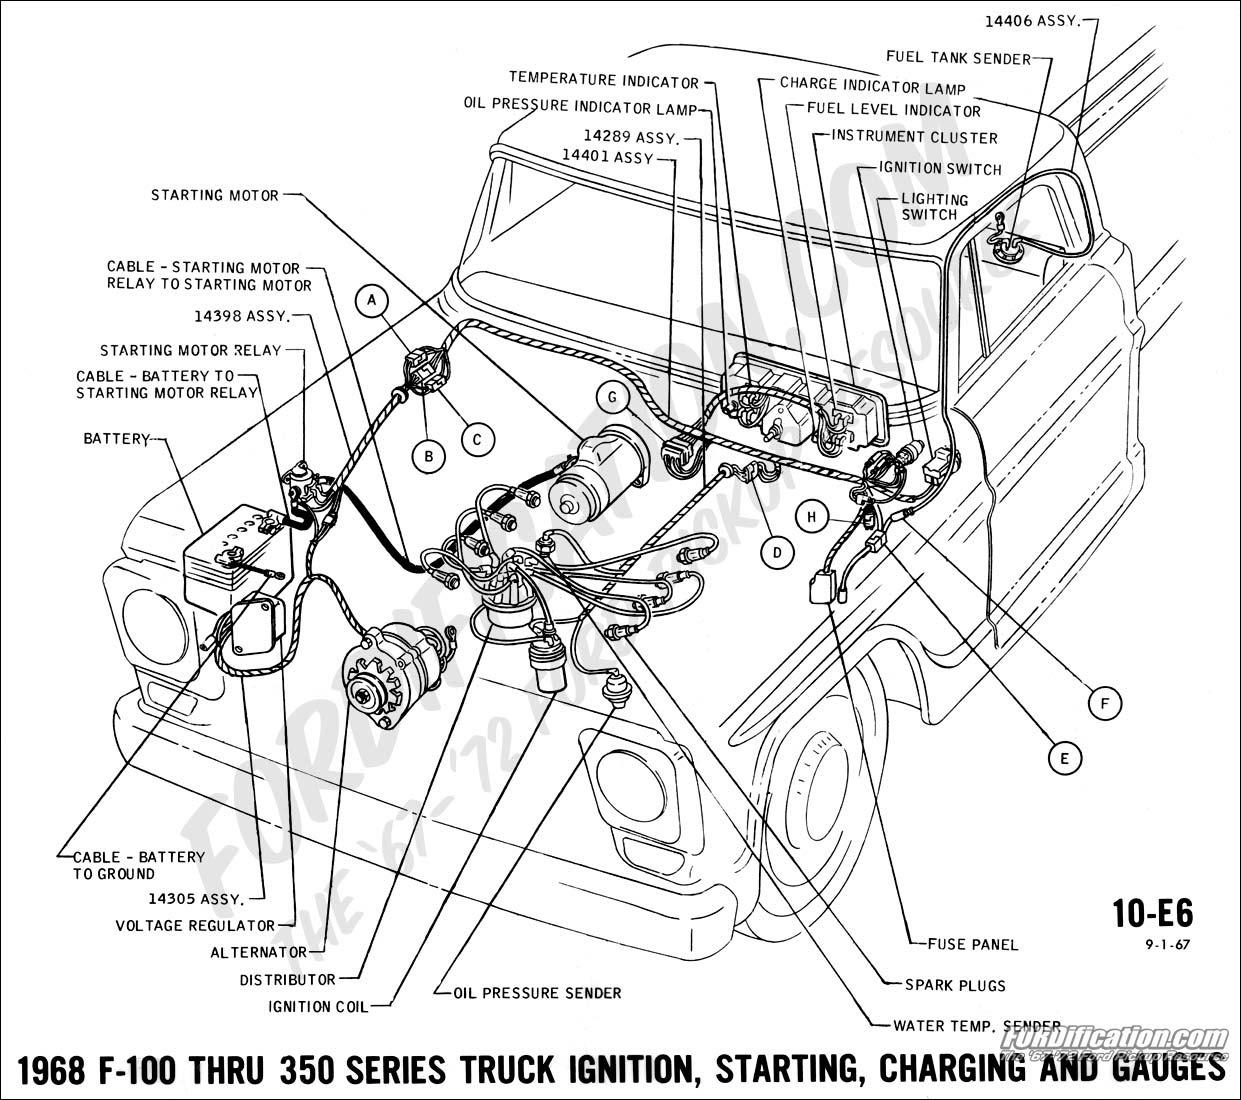 1987 Gm Fuse Box Diagram - Wiring Diagrams